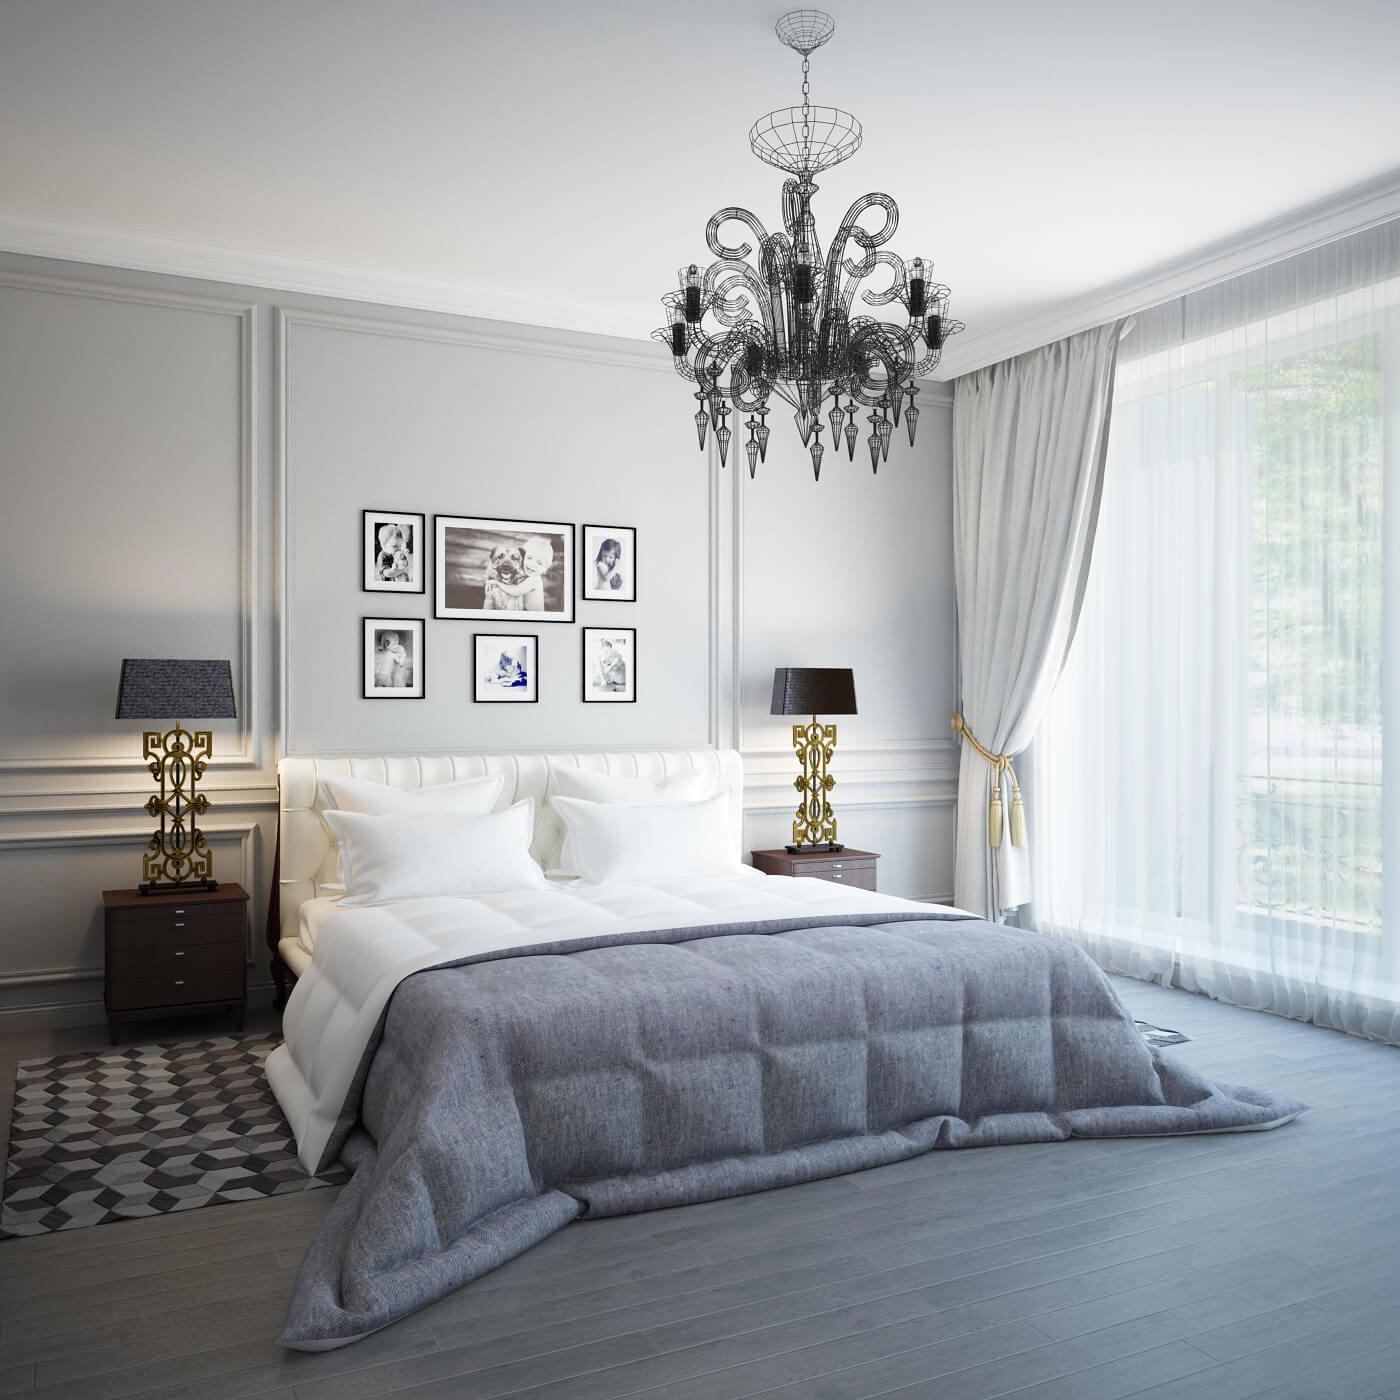 Modern bedroom design with chandelier